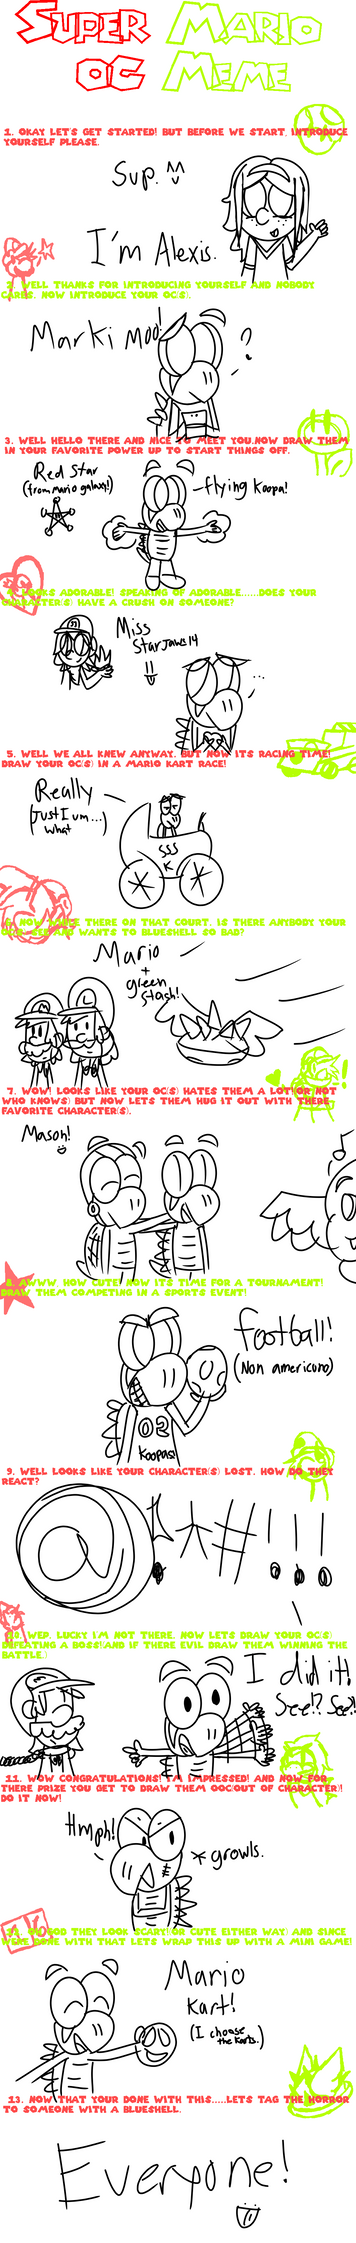 Mario OC meme /w Mark by CrazyStarlightRene01